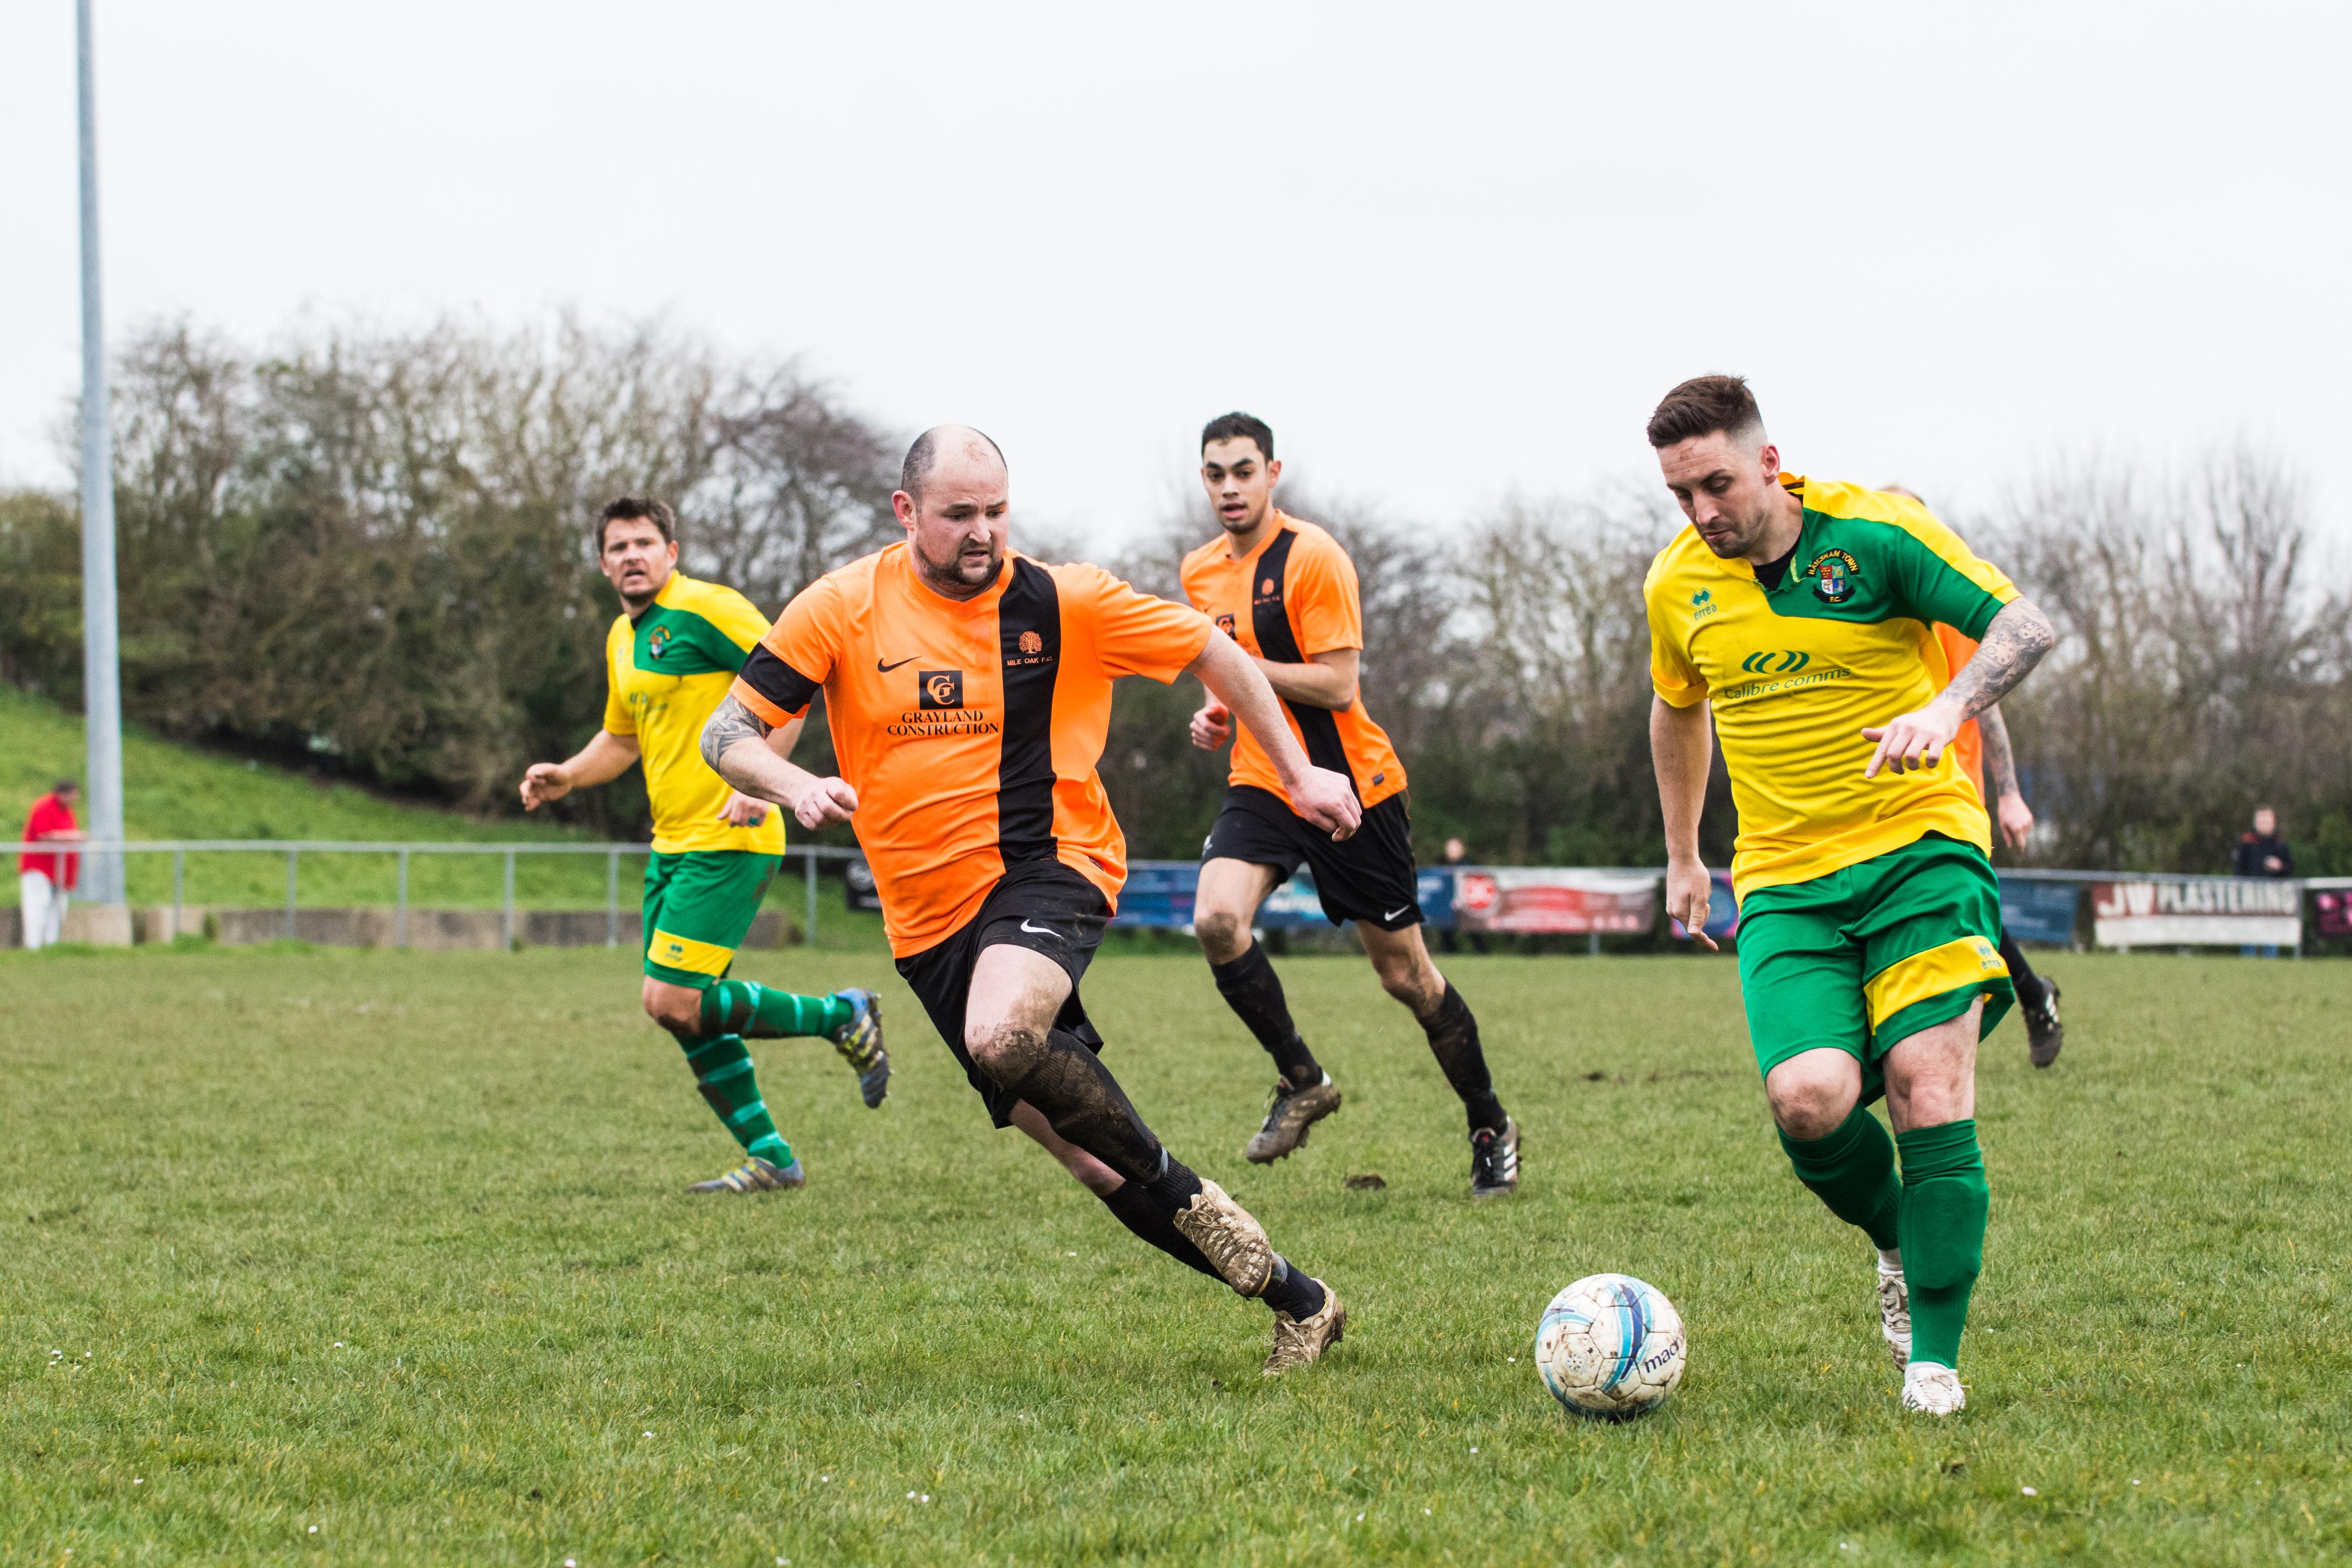 DAVID_JEFFERY Mile Oak FC vs Hailsham Town FC 24.03.18 67